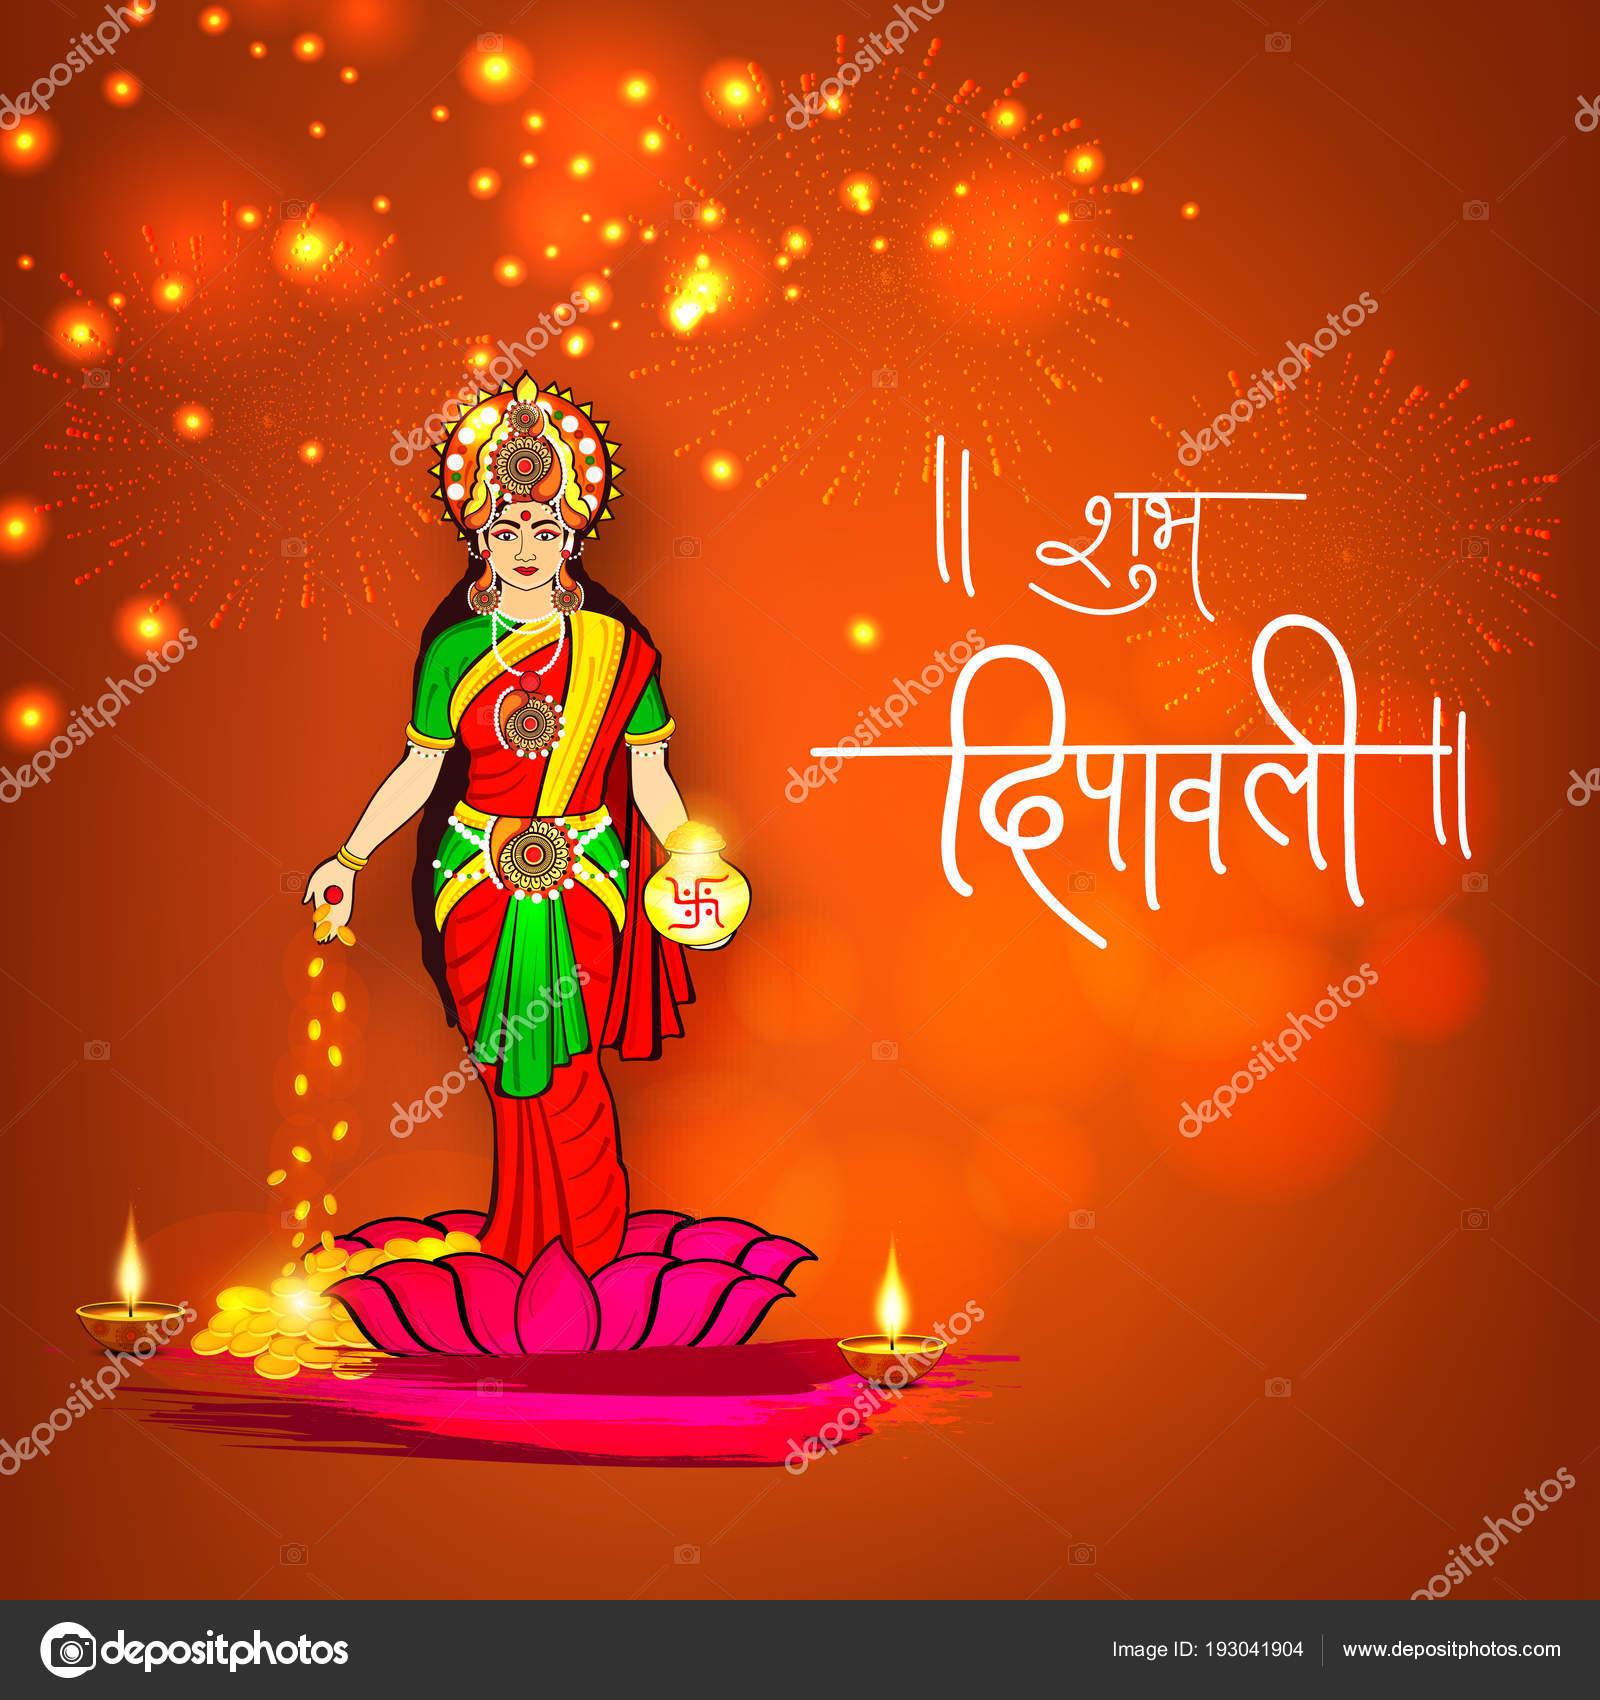 Happy diwali celebration hindi text shubh diwali greeting card happy diwali celebration hindi text shubh diwali greeting card stock vector m4hsunfo